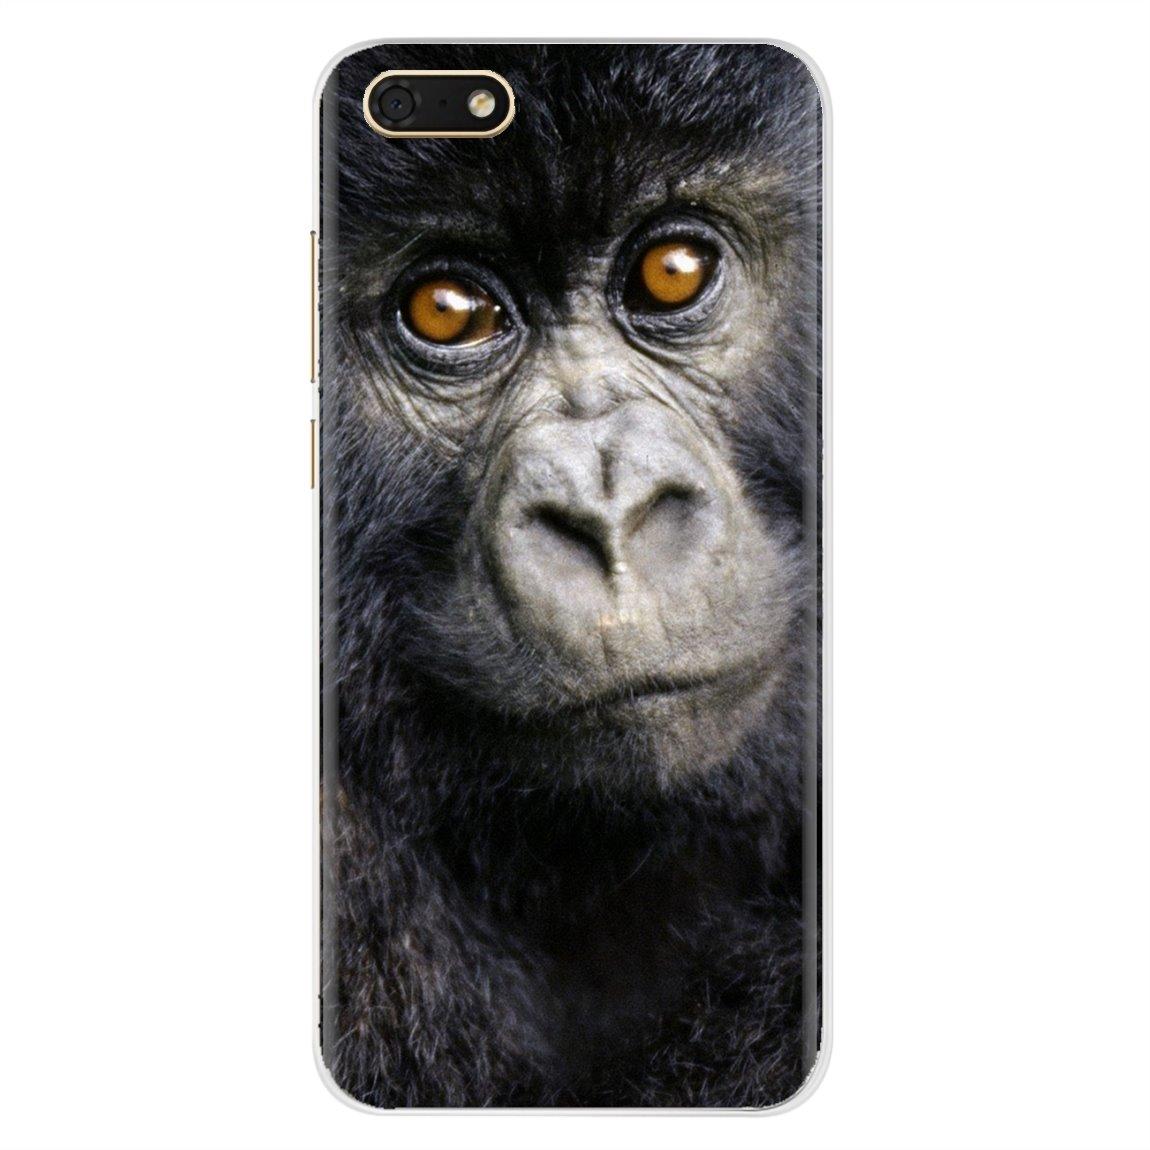 Personalizado caja del teléfono de silicona gorila enojado para Samsung Galaxy S6 borde S10 Lite Plus Core gran primer alfa J1 mini